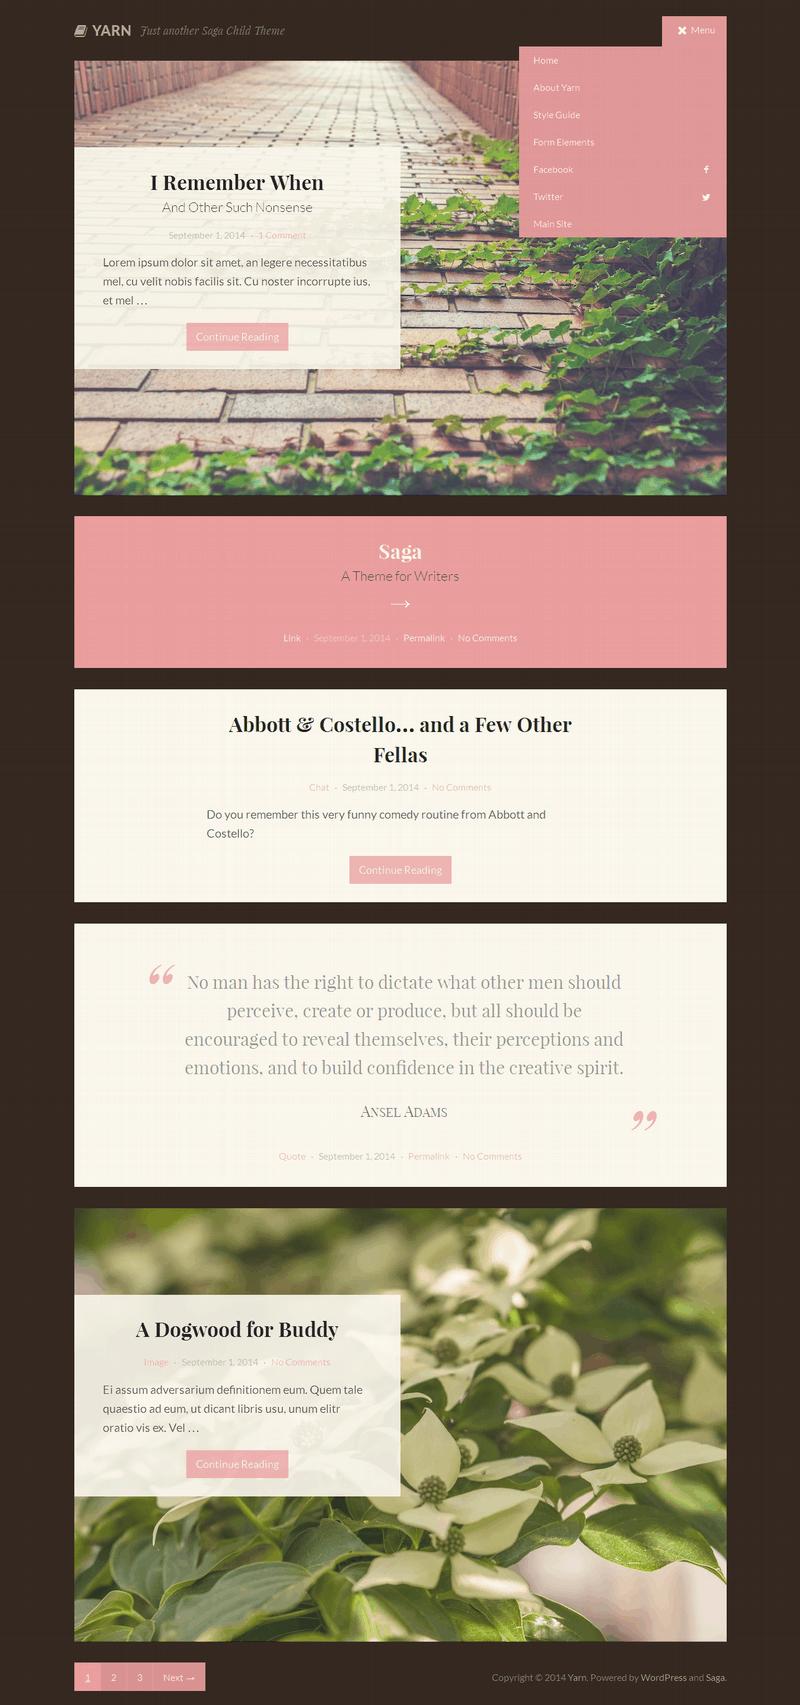 yarn-free-wordpress-blogging-theme-2